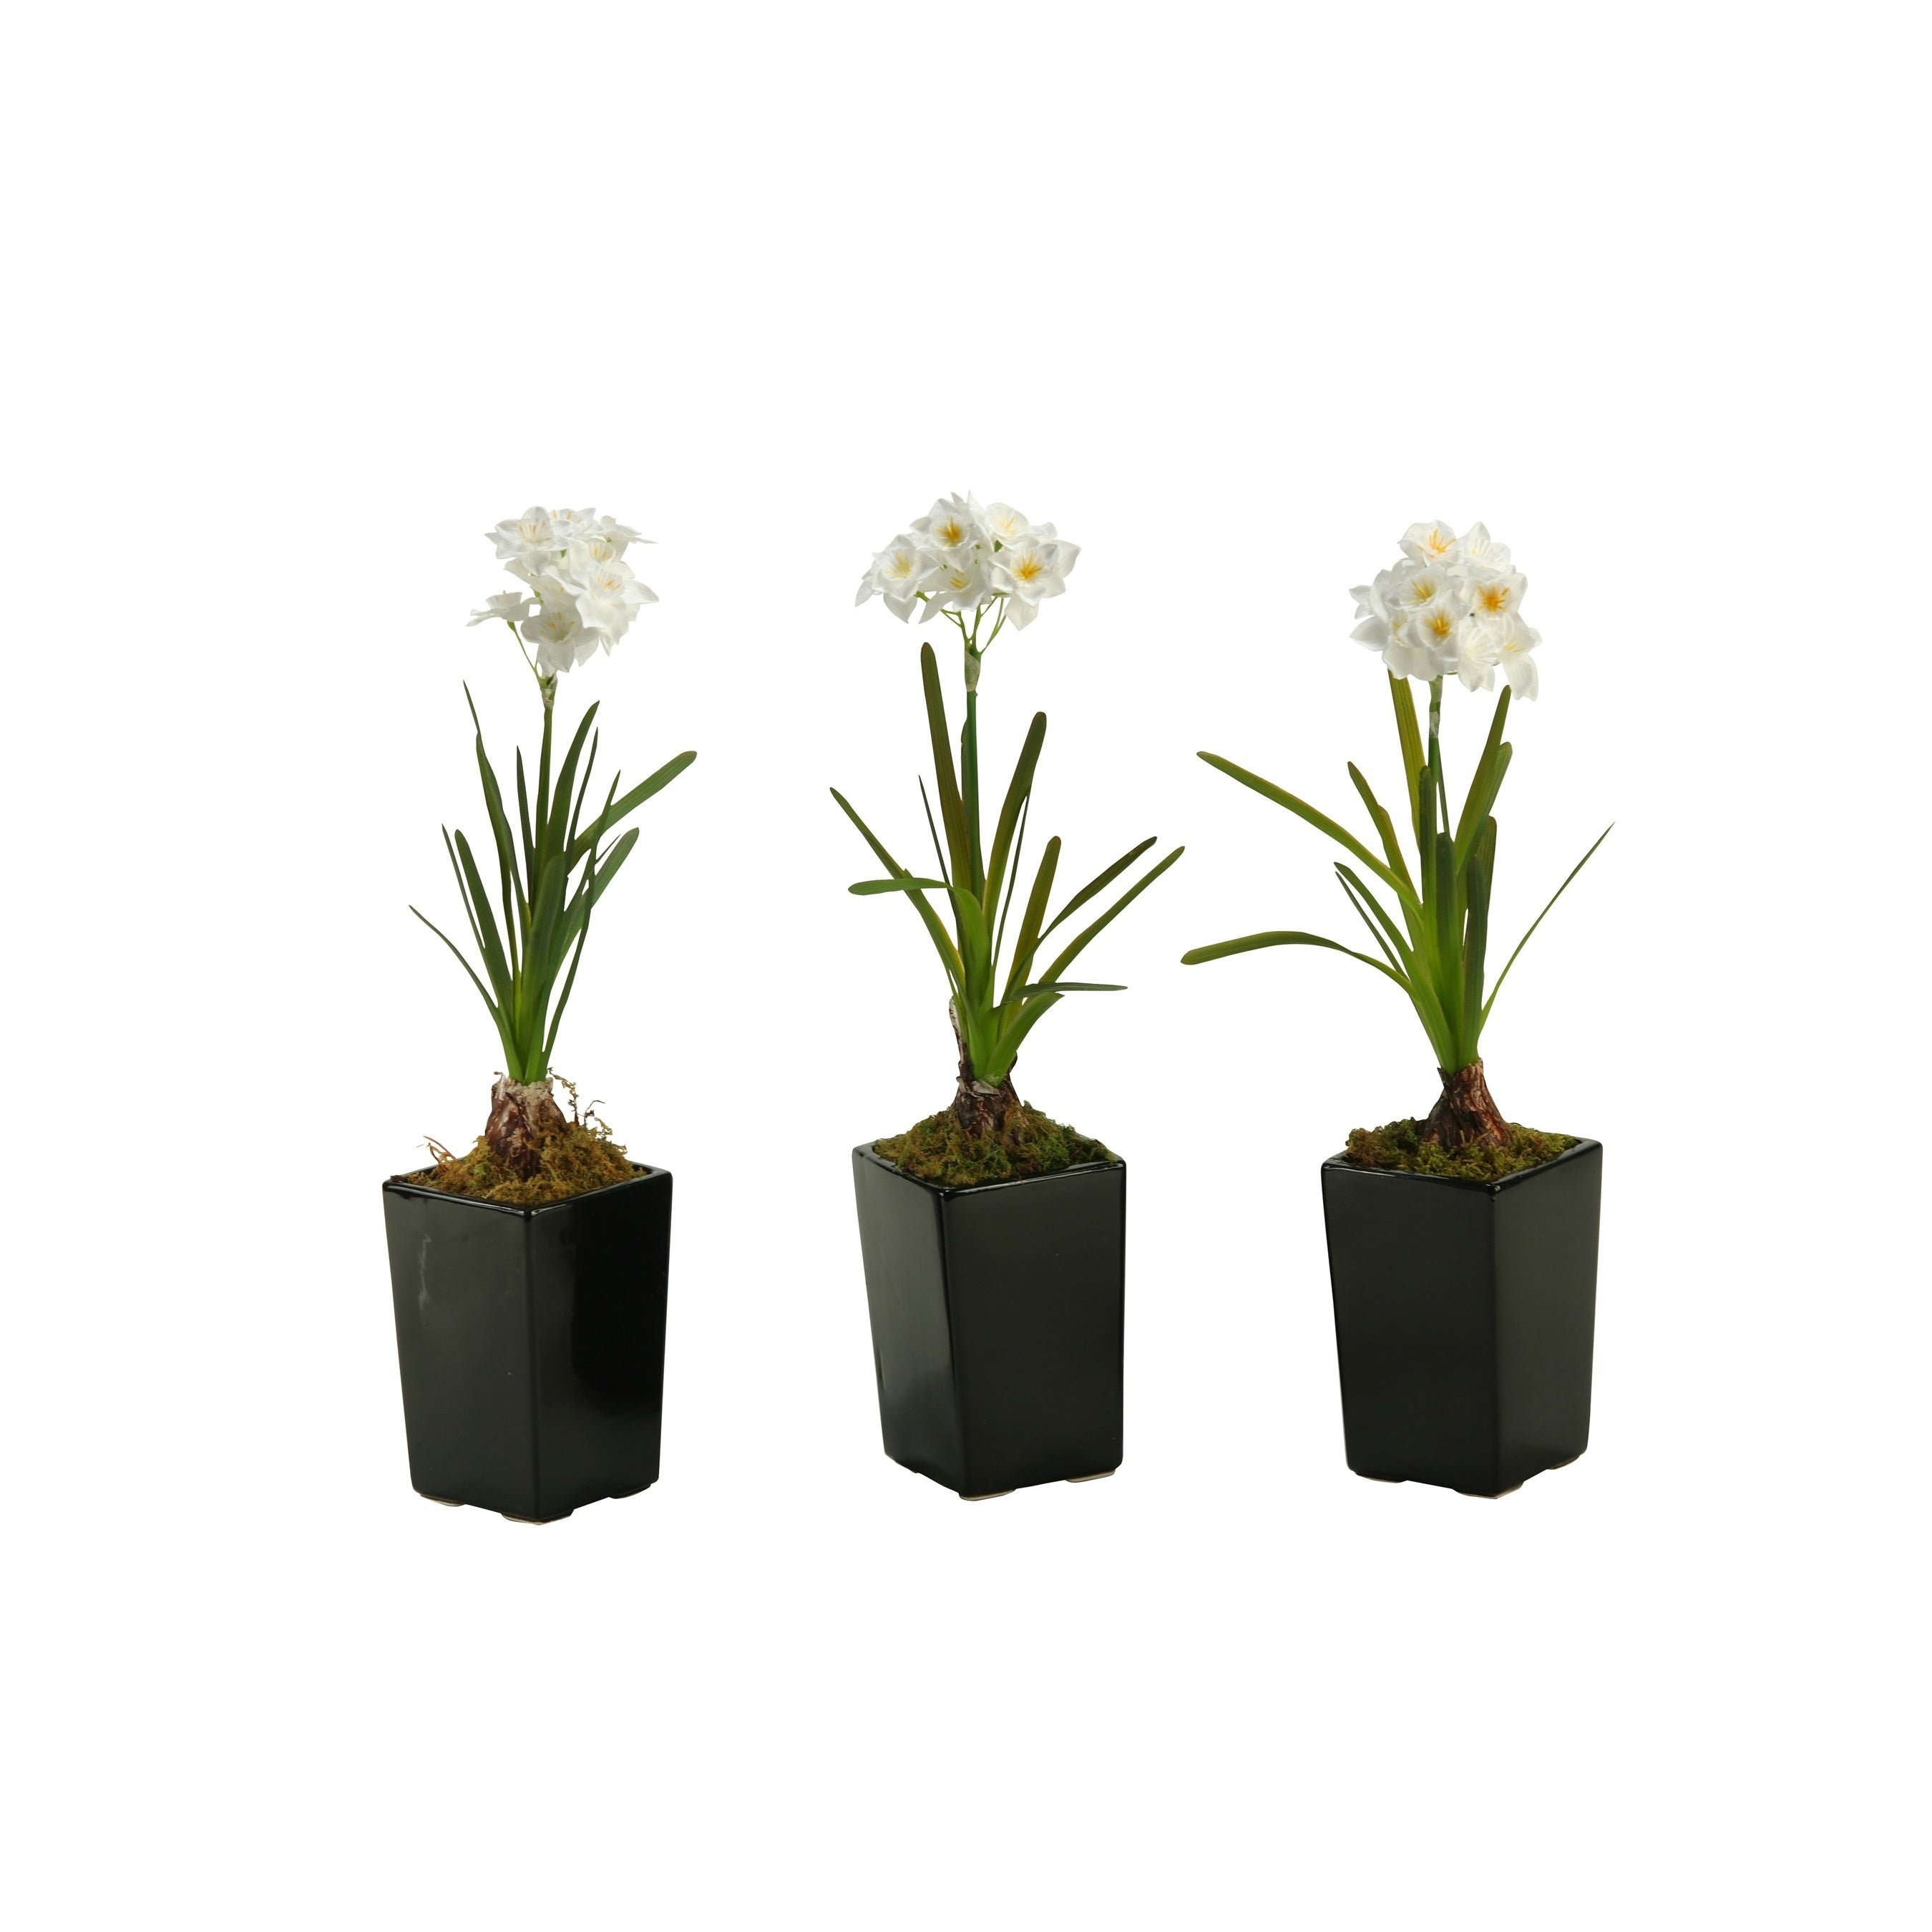 D&W Silks Paper White Bulb in Square Ceramic Planter (Set of 3) (Planter)